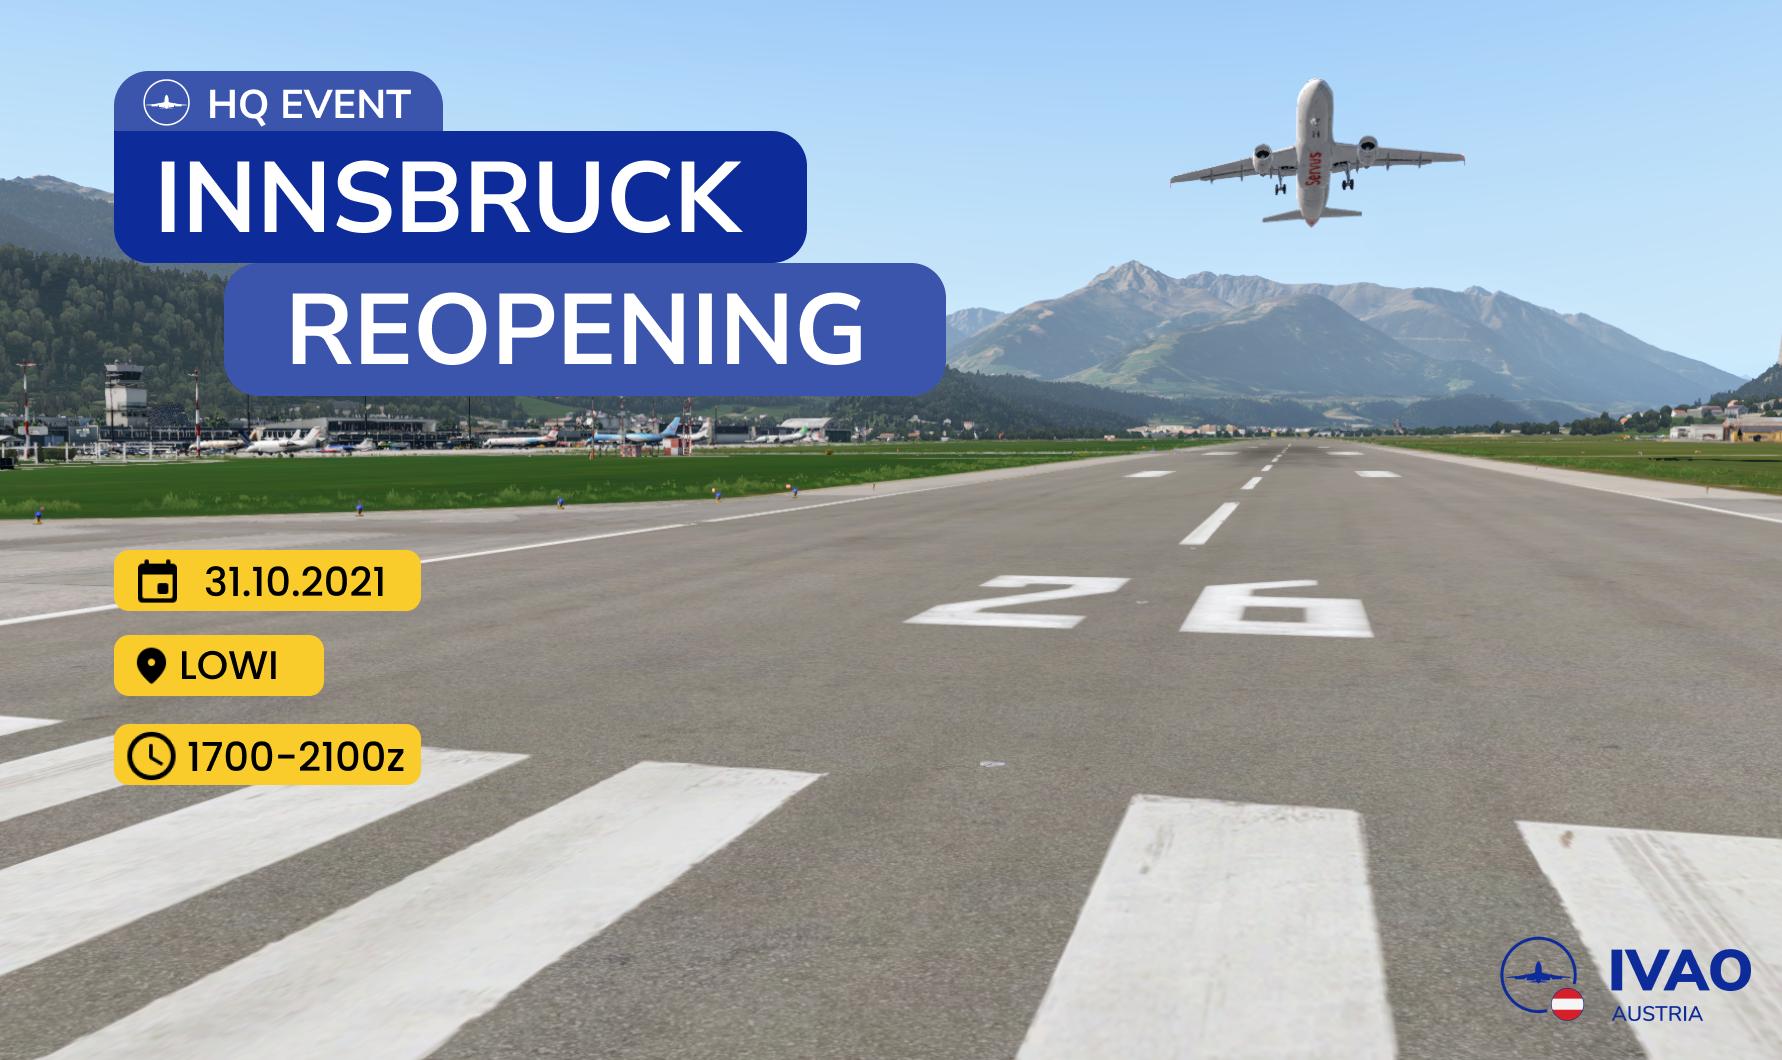 Innsbruck Reopening